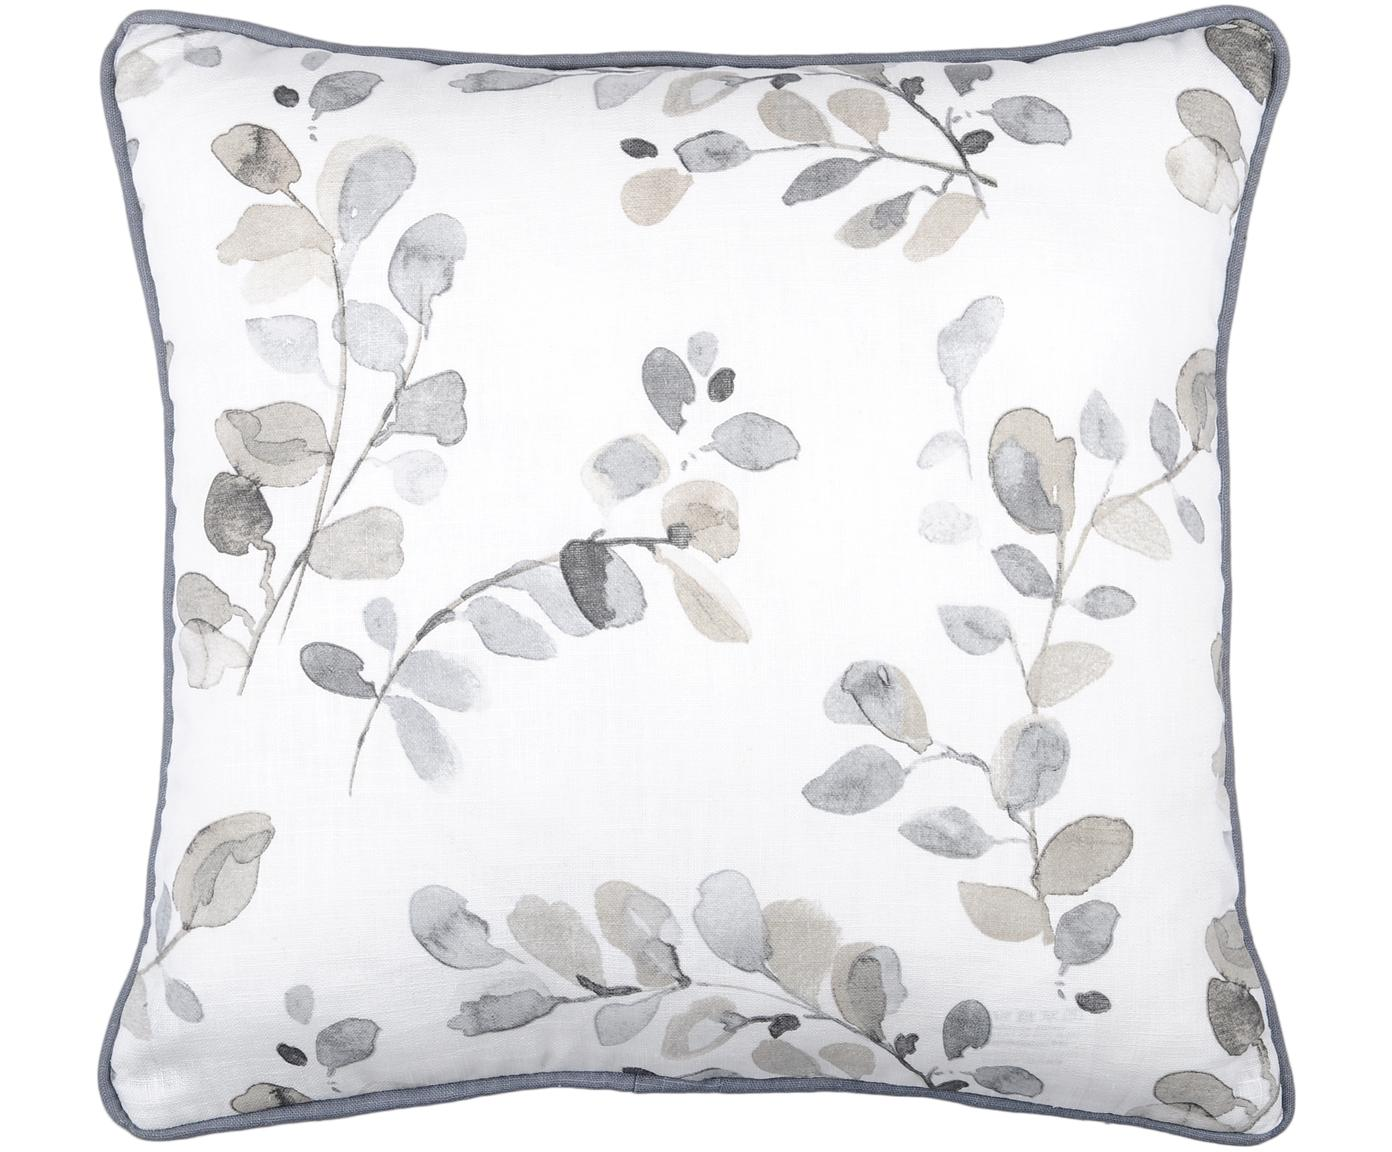 Cuscino con imbottitura Acacia, Rivestimento: 92% ramiè, 8% cotone, Bianco, beige, blu grigio, Larg. 40 x Lung. 40 cm